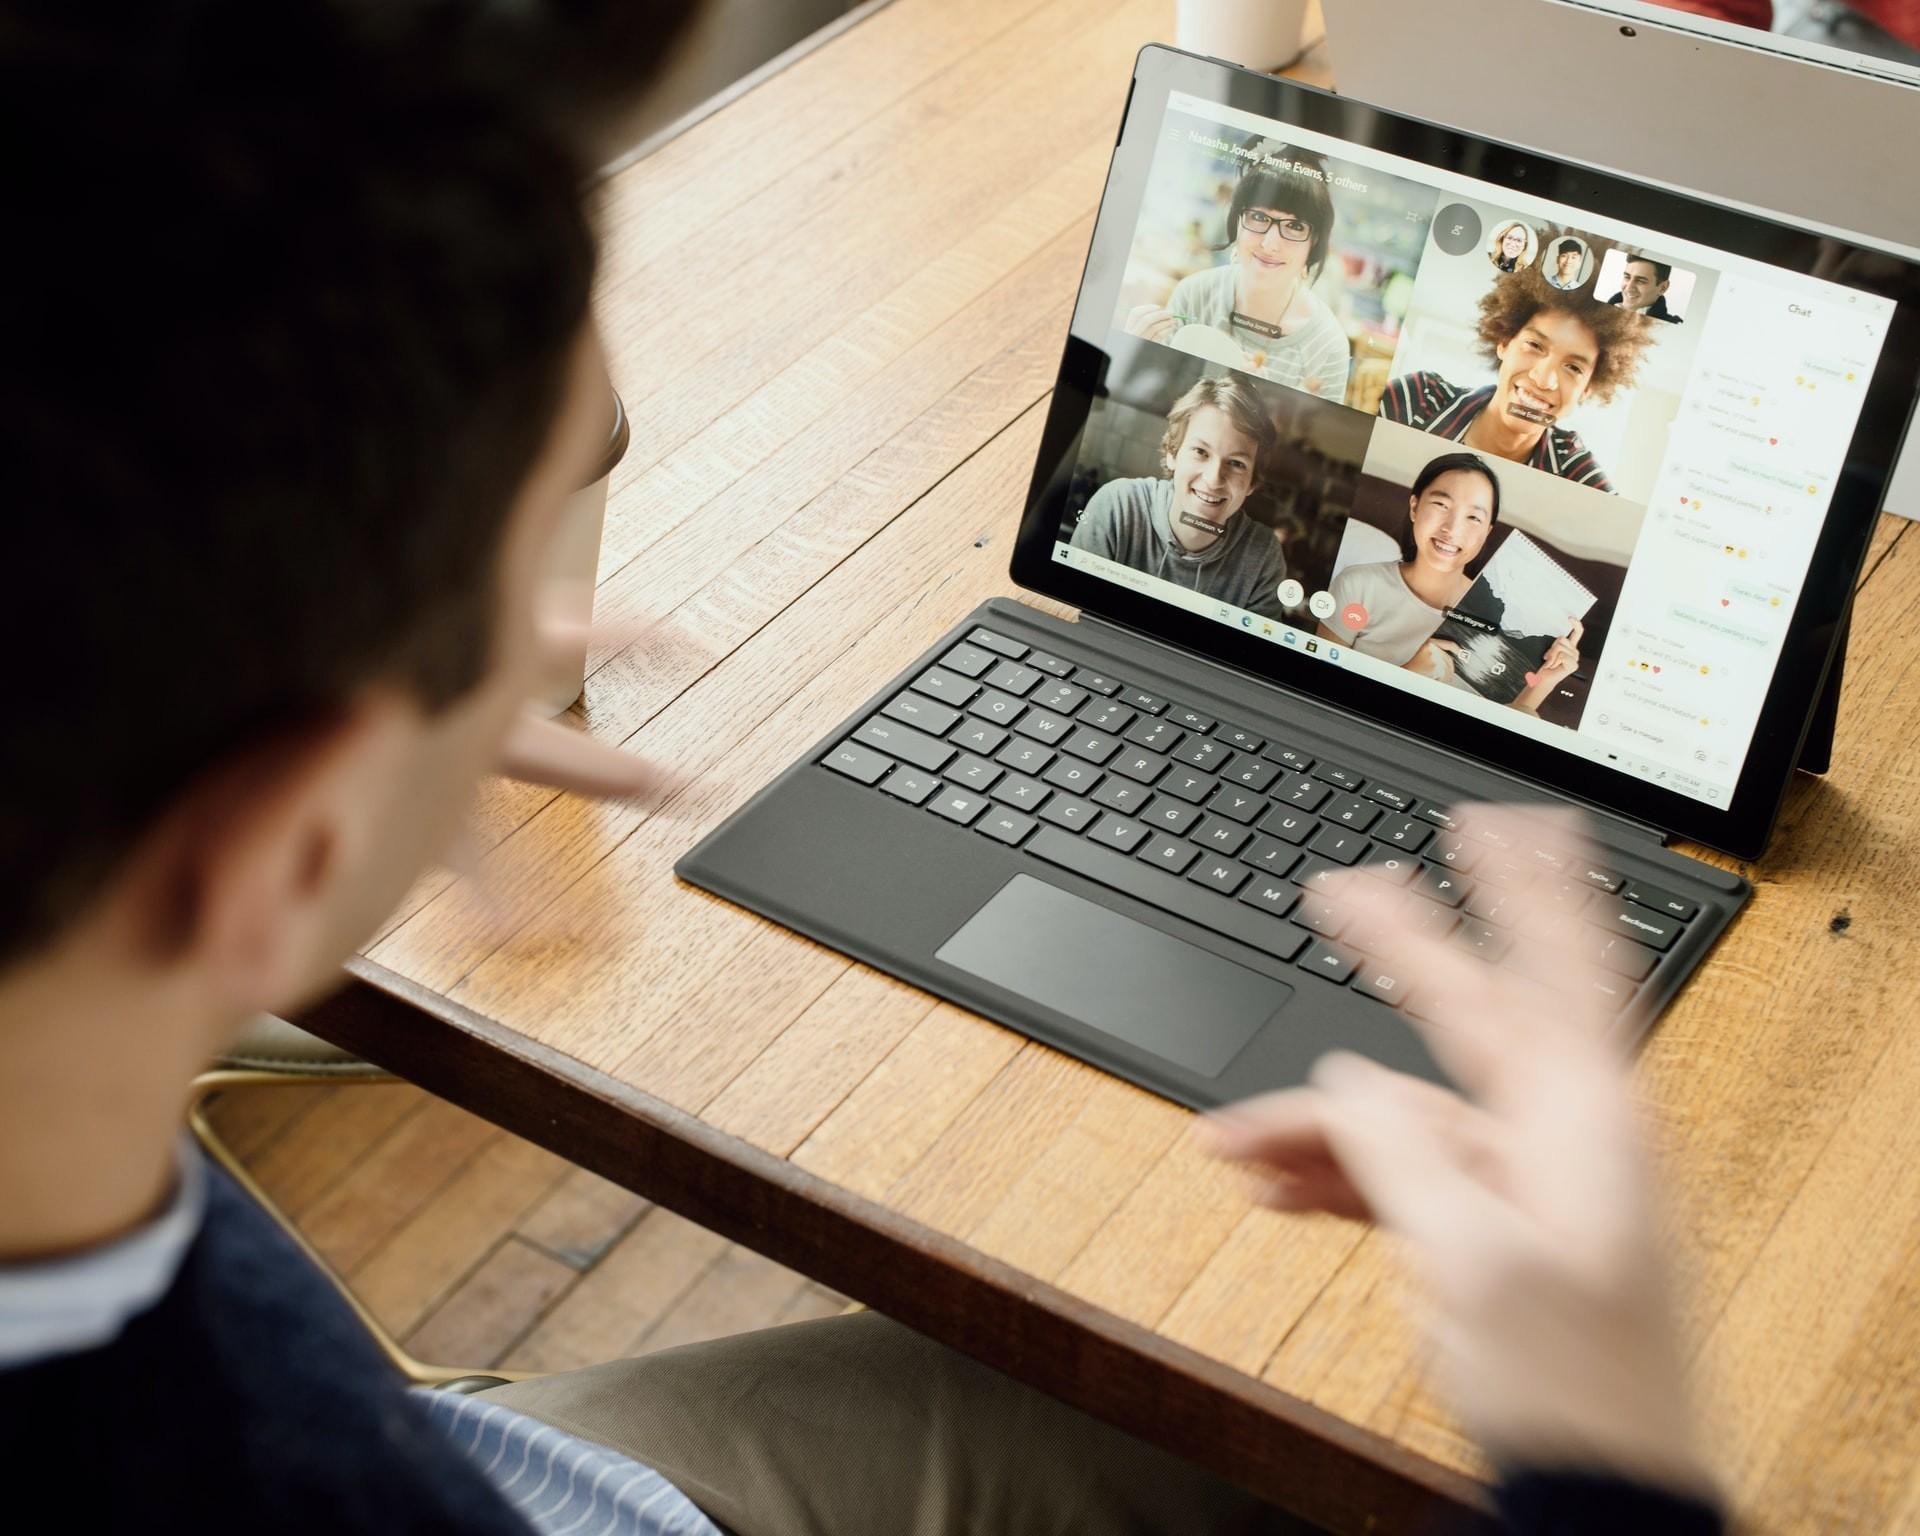 Teacher talks to students through an online learning platform video call.